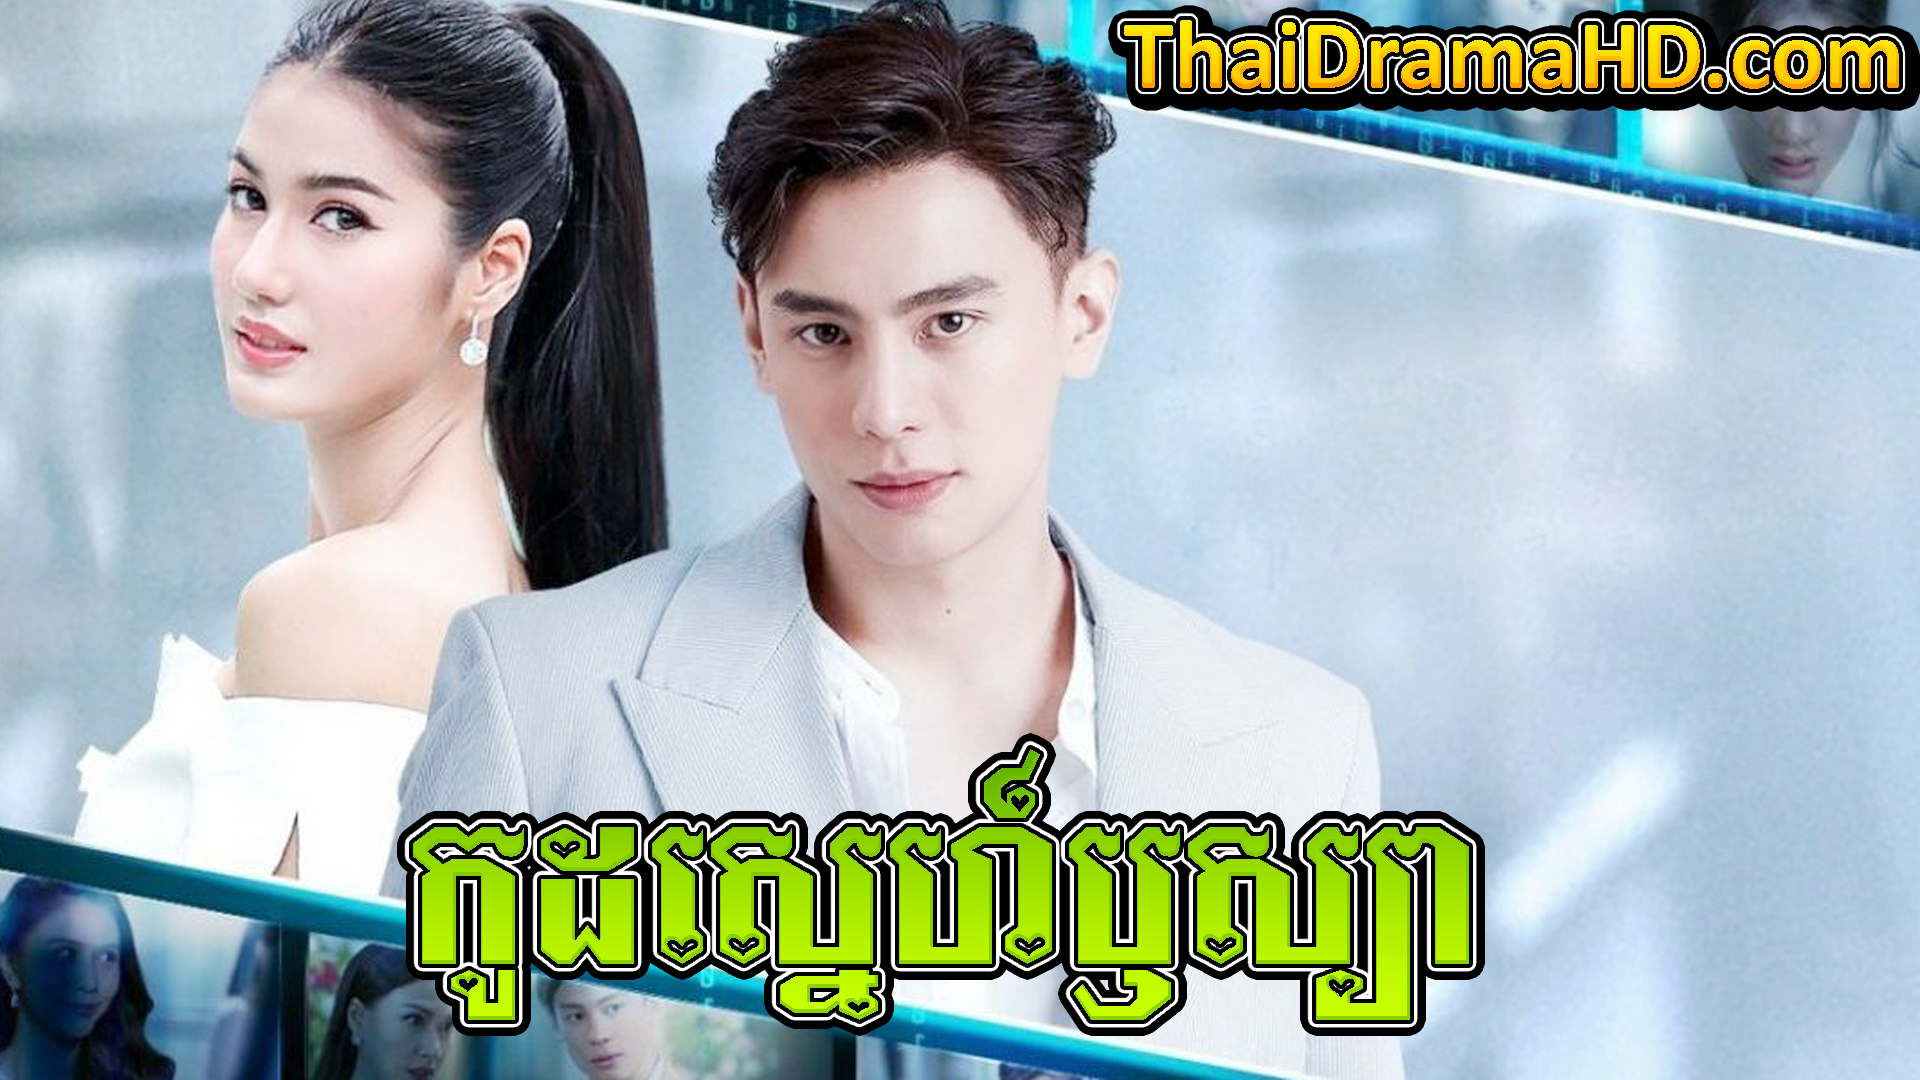 Code Sne Russya, Thai Drama, Thai Drama HD, Khmer Movie, Phumikhmer, Phumikhmer1, movie-khmer, video4khmer, khmotions, kolabkhmer, khmer drama, ksdrama, cookingtips, roscheat, khmertimeskh, khmerkomsan, phumi7, merlkon, film2us, movie2kh, sweetdrama, khmercitylove, khreplay, tvb cambodia drama, ckh7, srokthai, phumimedia, phumi8, khmer avenue, khmer search, Soyo, khmerfans